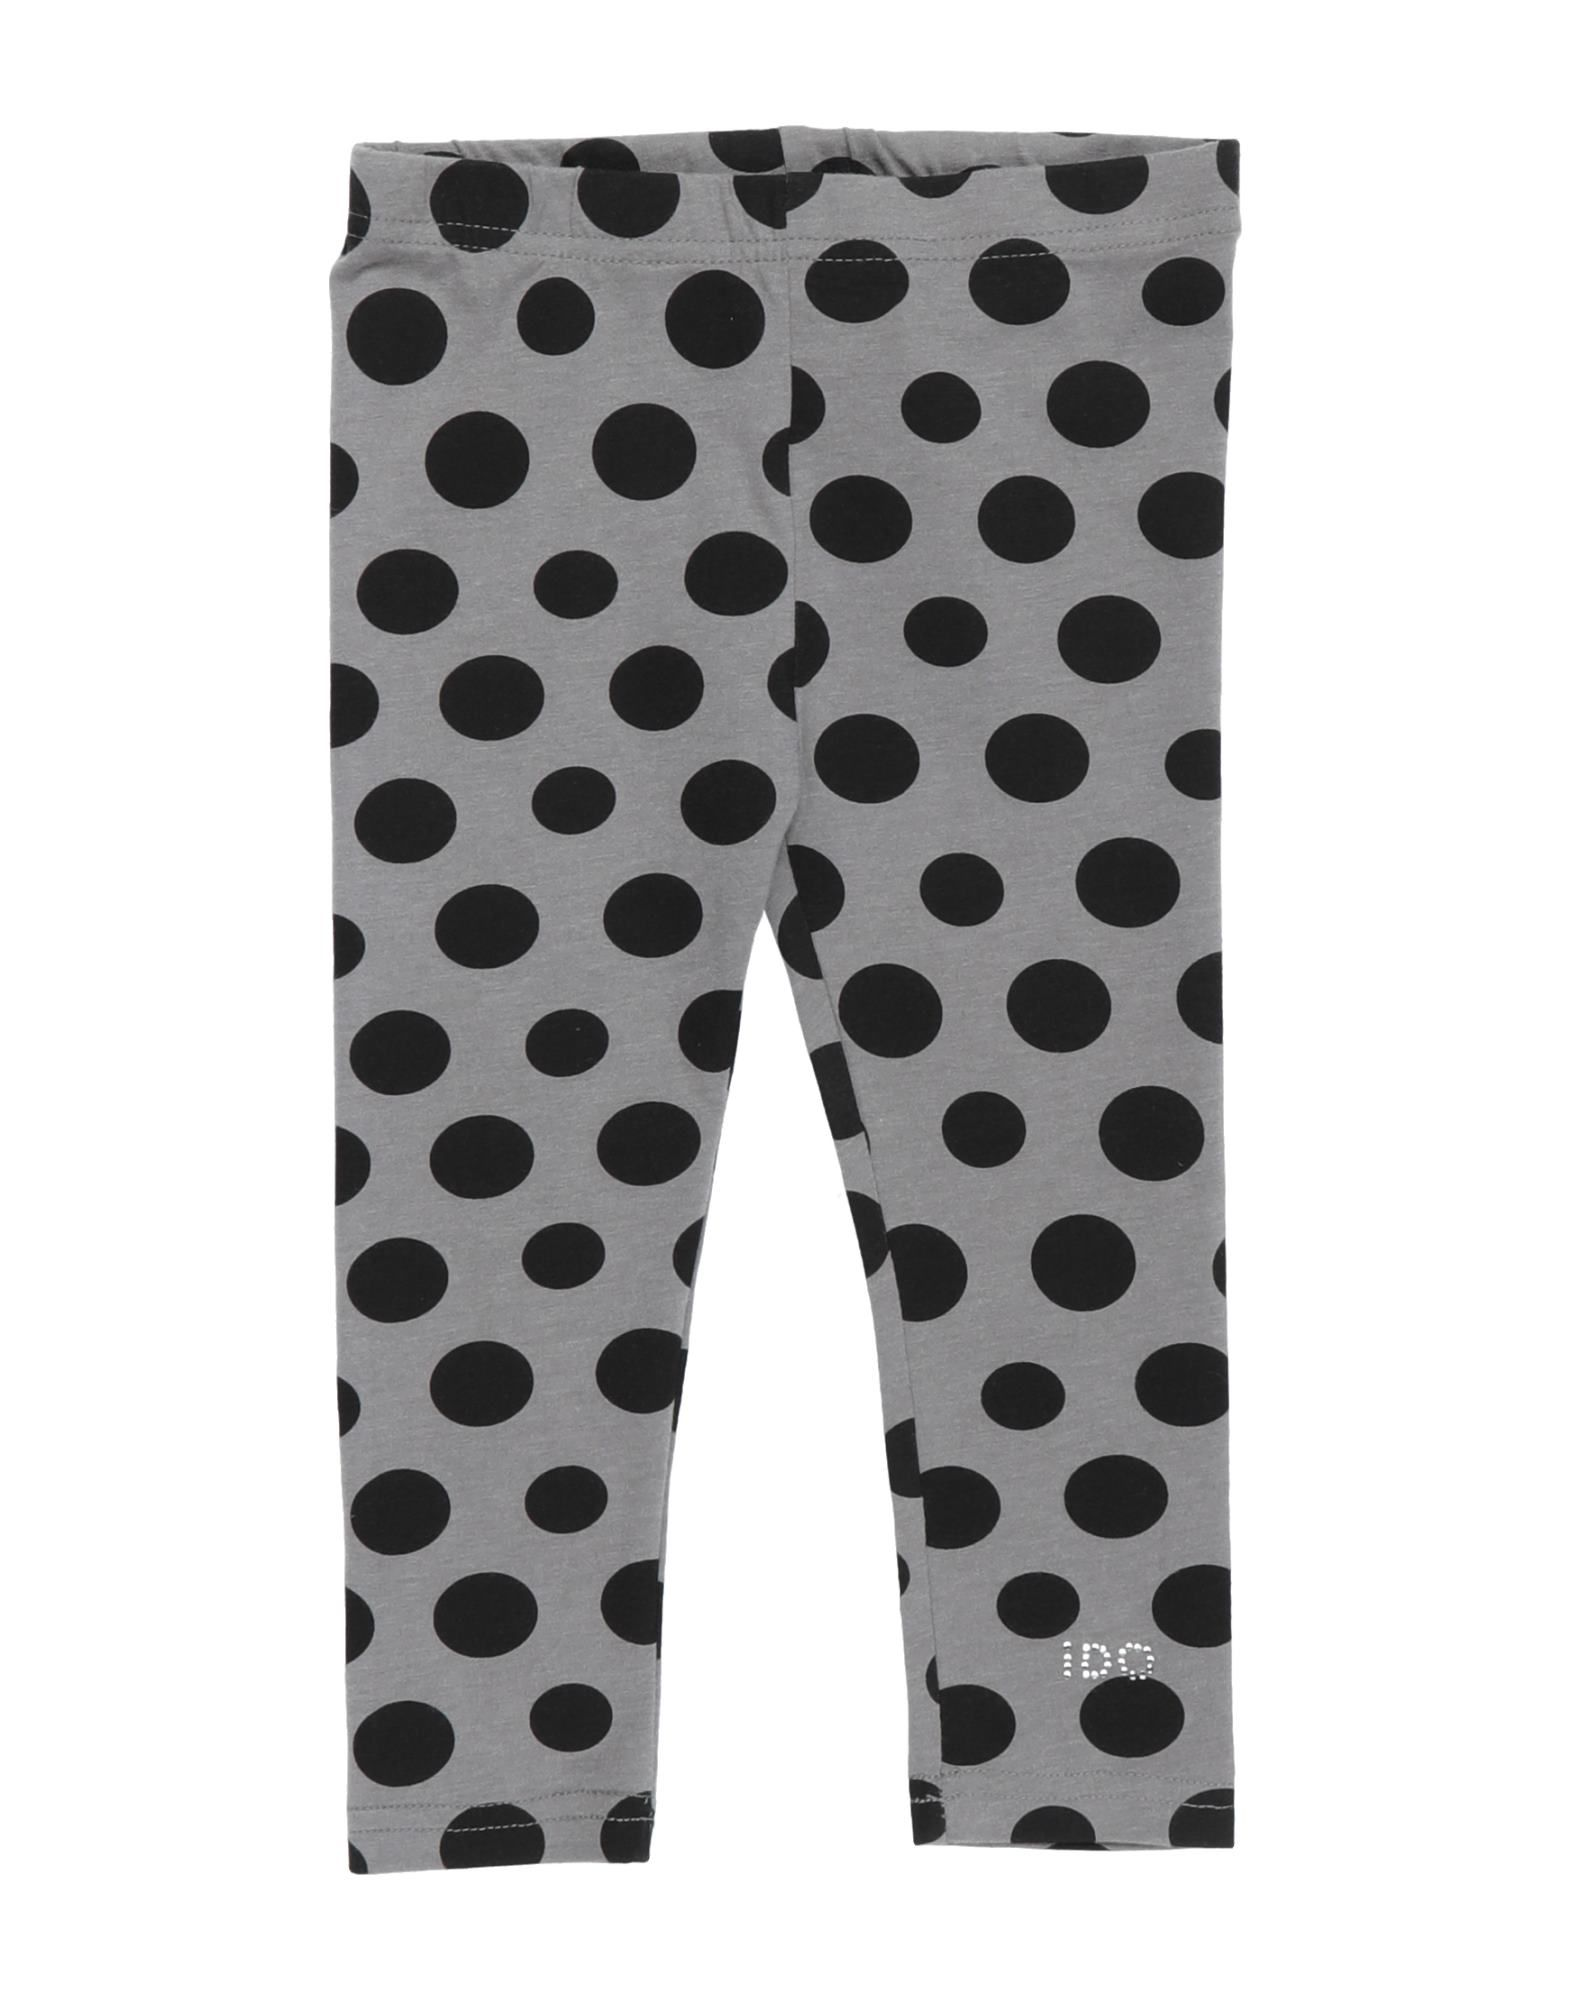 Ido By Miniconf Kids' Leggings In Gray